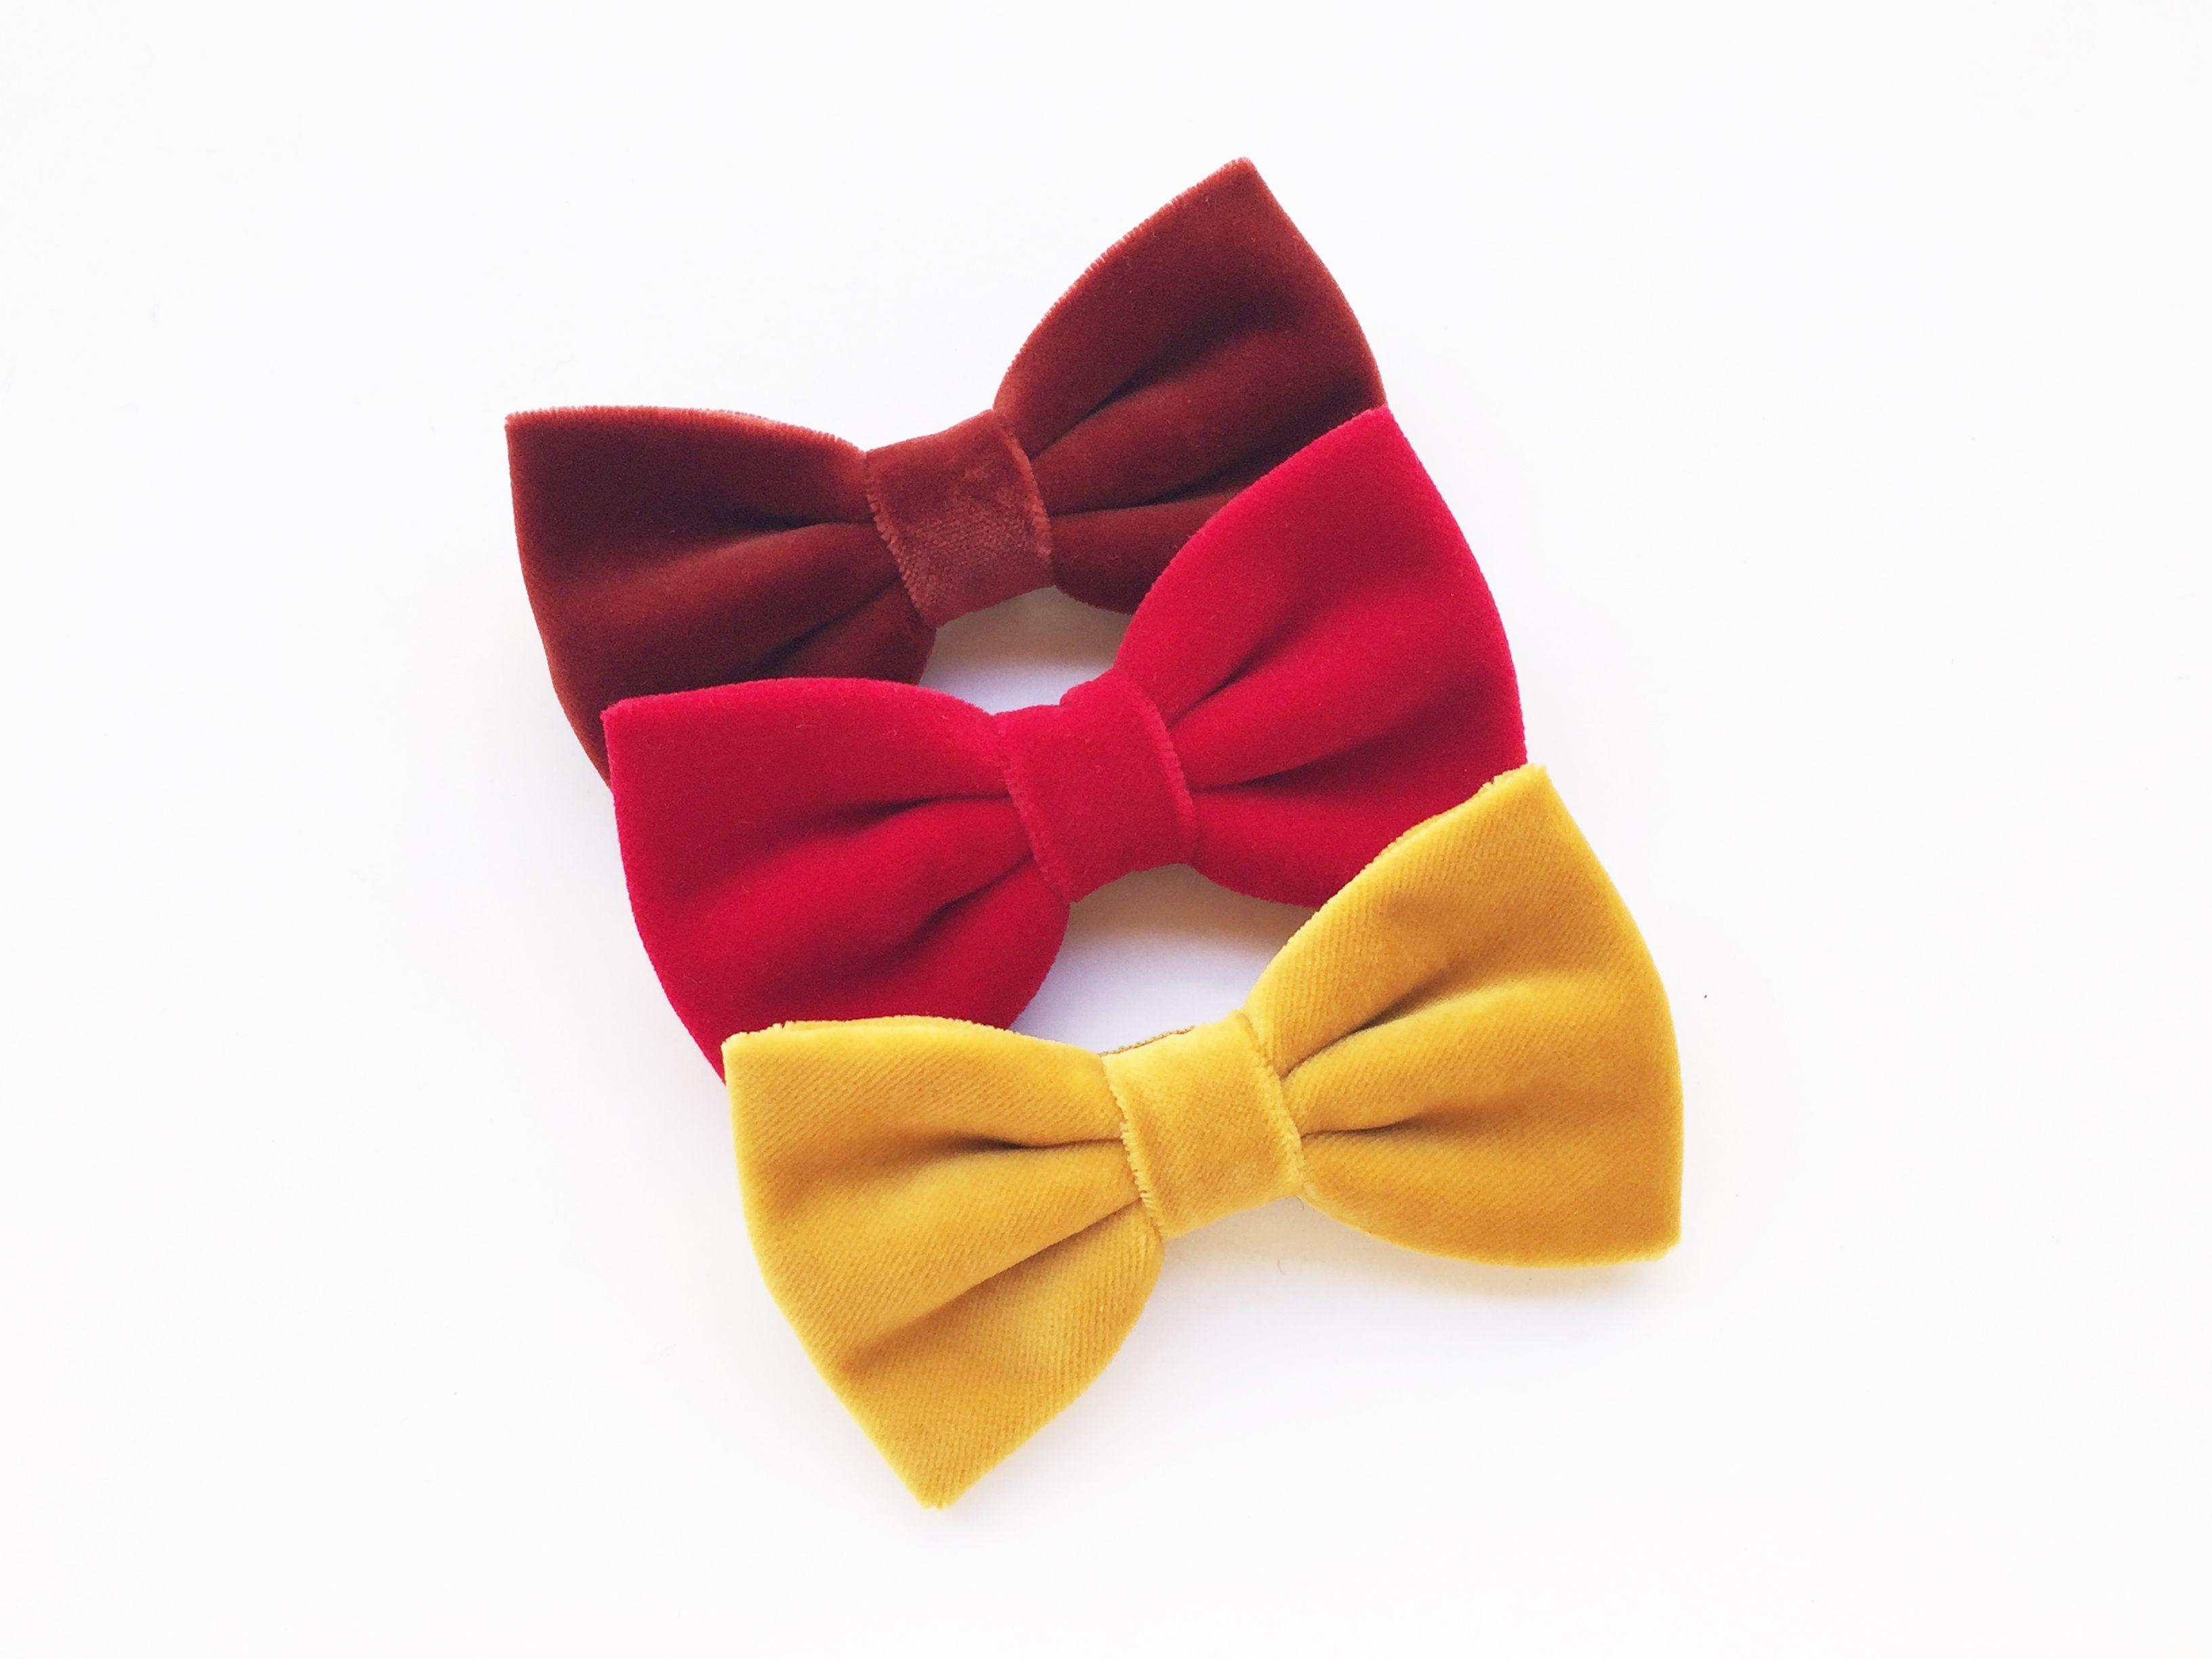 Velvet Bow tie for men #scoccapapillon Made in Italy. Color Rust, Red, Mustard,  Shop > www.scoccapapillon.etsy.com. #velvet #velvetbowtie #velvetinspiration #wedding #winterwedding #bowtie #bowties #groom #groomsmen #sposo #velluto #mensfashion #matrimonio #christmasgift #christimasinspiration #christmas2018 #rust #red #mustard #autumncolor #autumnwedding #autumntrends